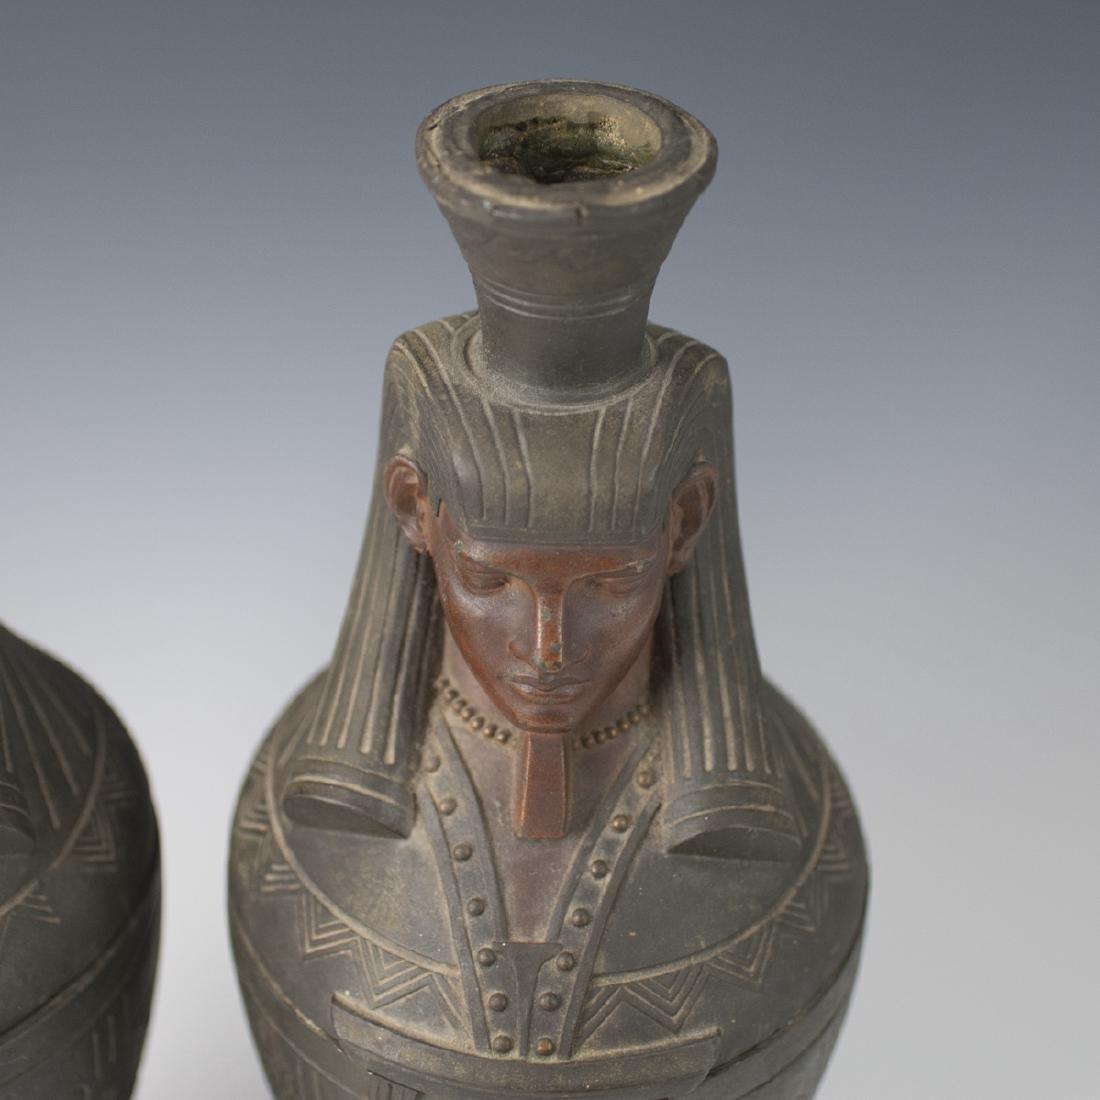 Polychromed White Metal Egyptian Motif Garnitures - 3